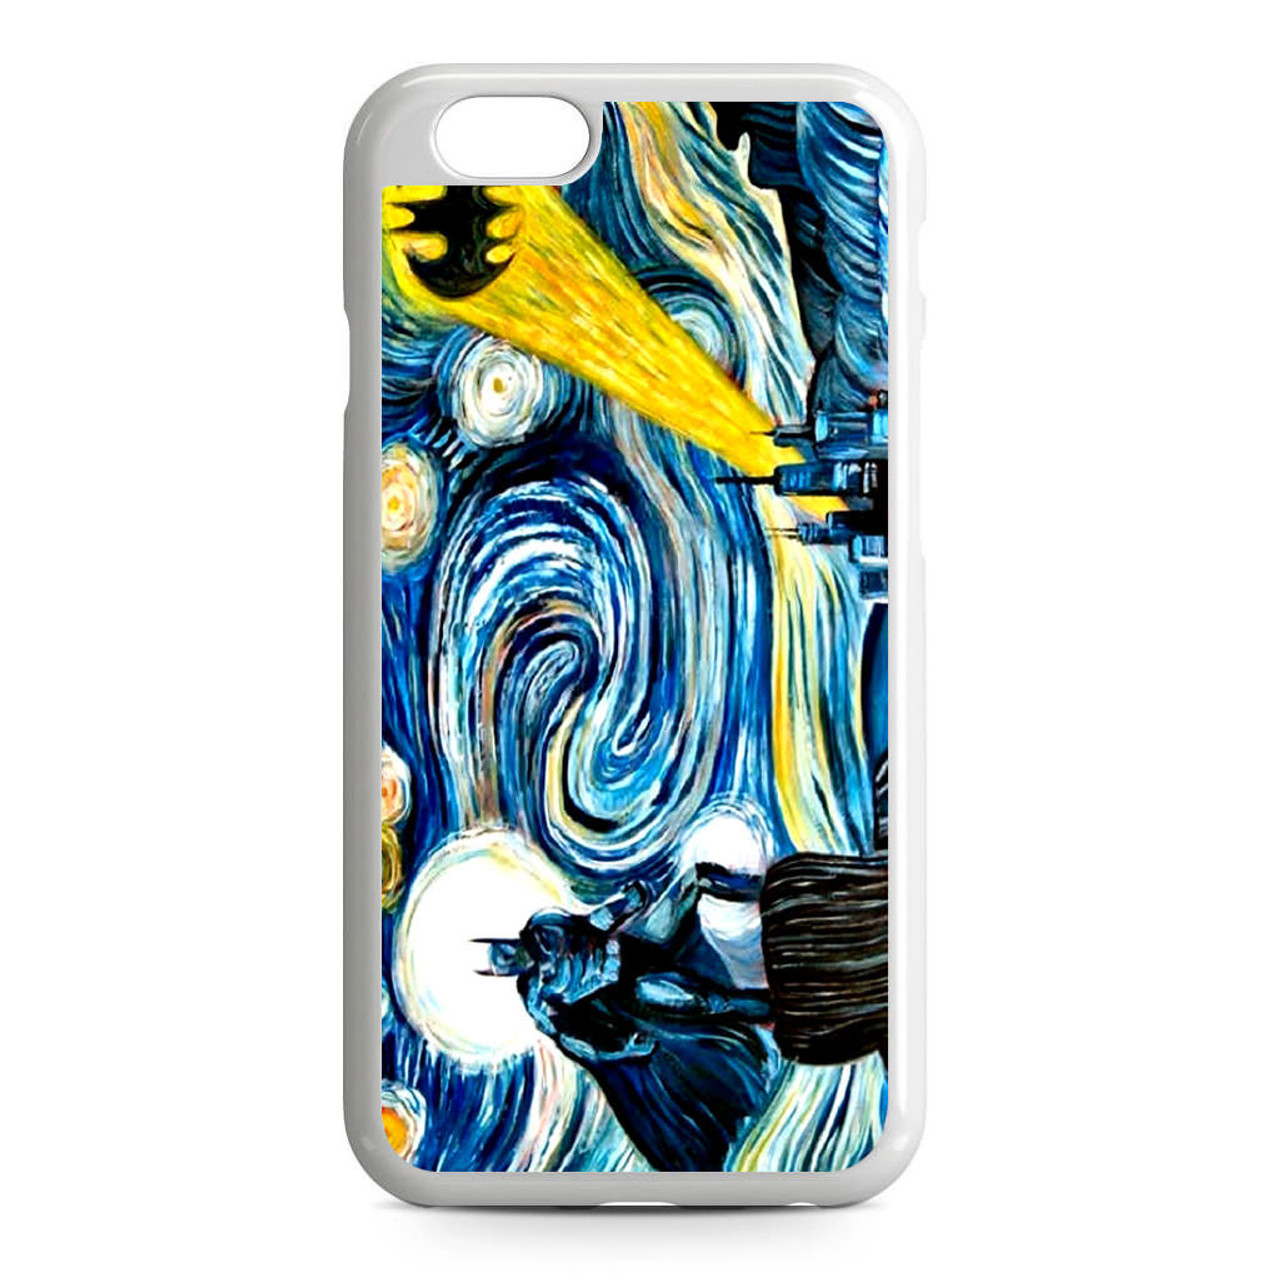 Batman Van Gogh Starry Night iPhone 6/6S Case